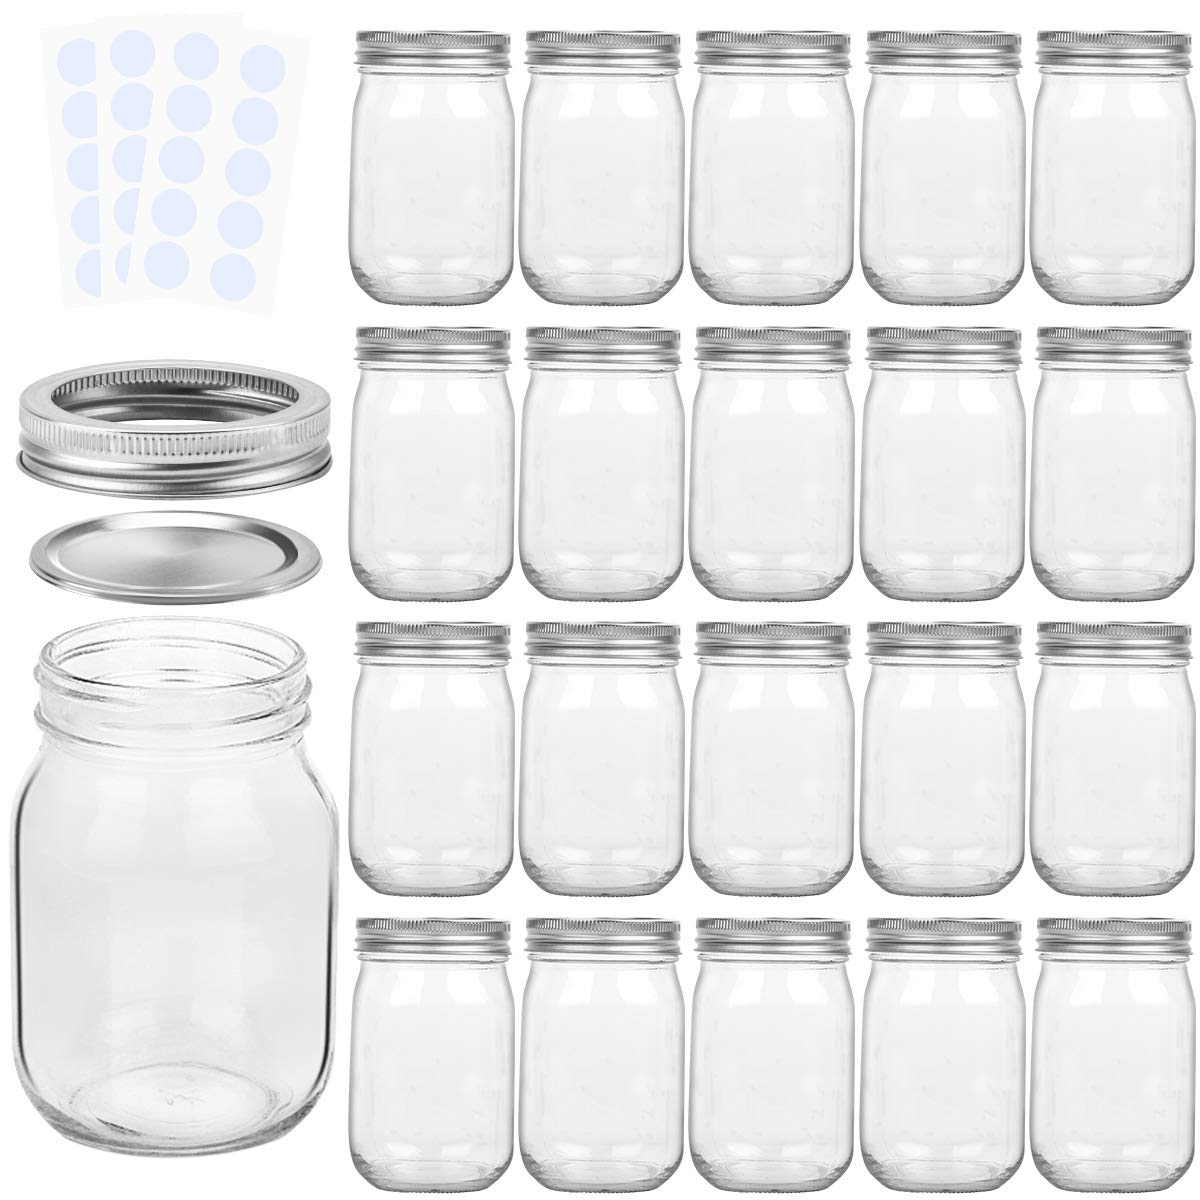 KAMOTA Mason Jars 12OZ With Regular Lids and Bands, Ideal for Jam, Honey, Wedding Favors, Shower Favors, Baby Foods, DIY Magnetic Spice Jars, 20 PACK, 30 Whiteboard Labels Included